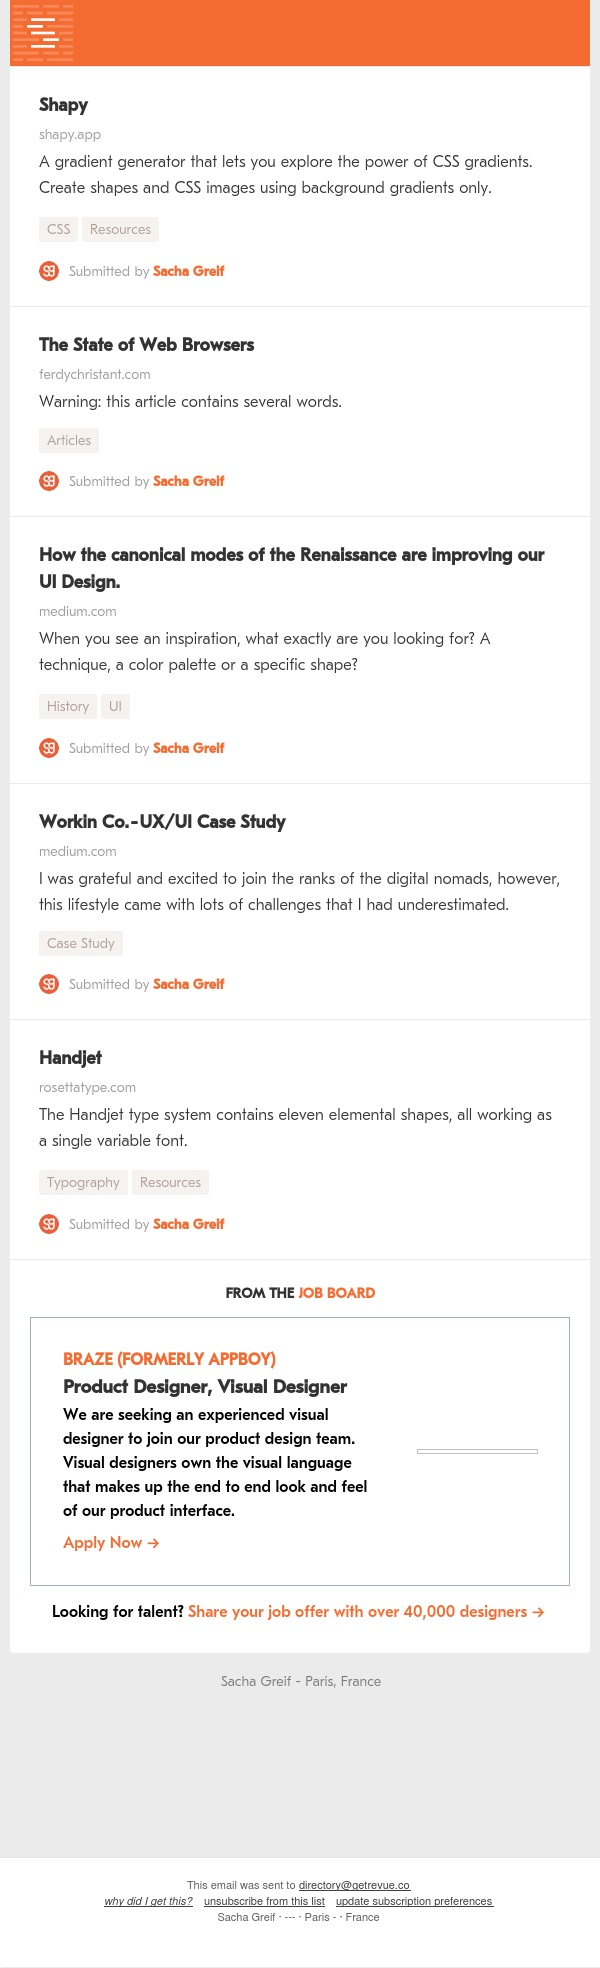 Shapy, Web Browsers, Renaissance, Workin Co, Handjet